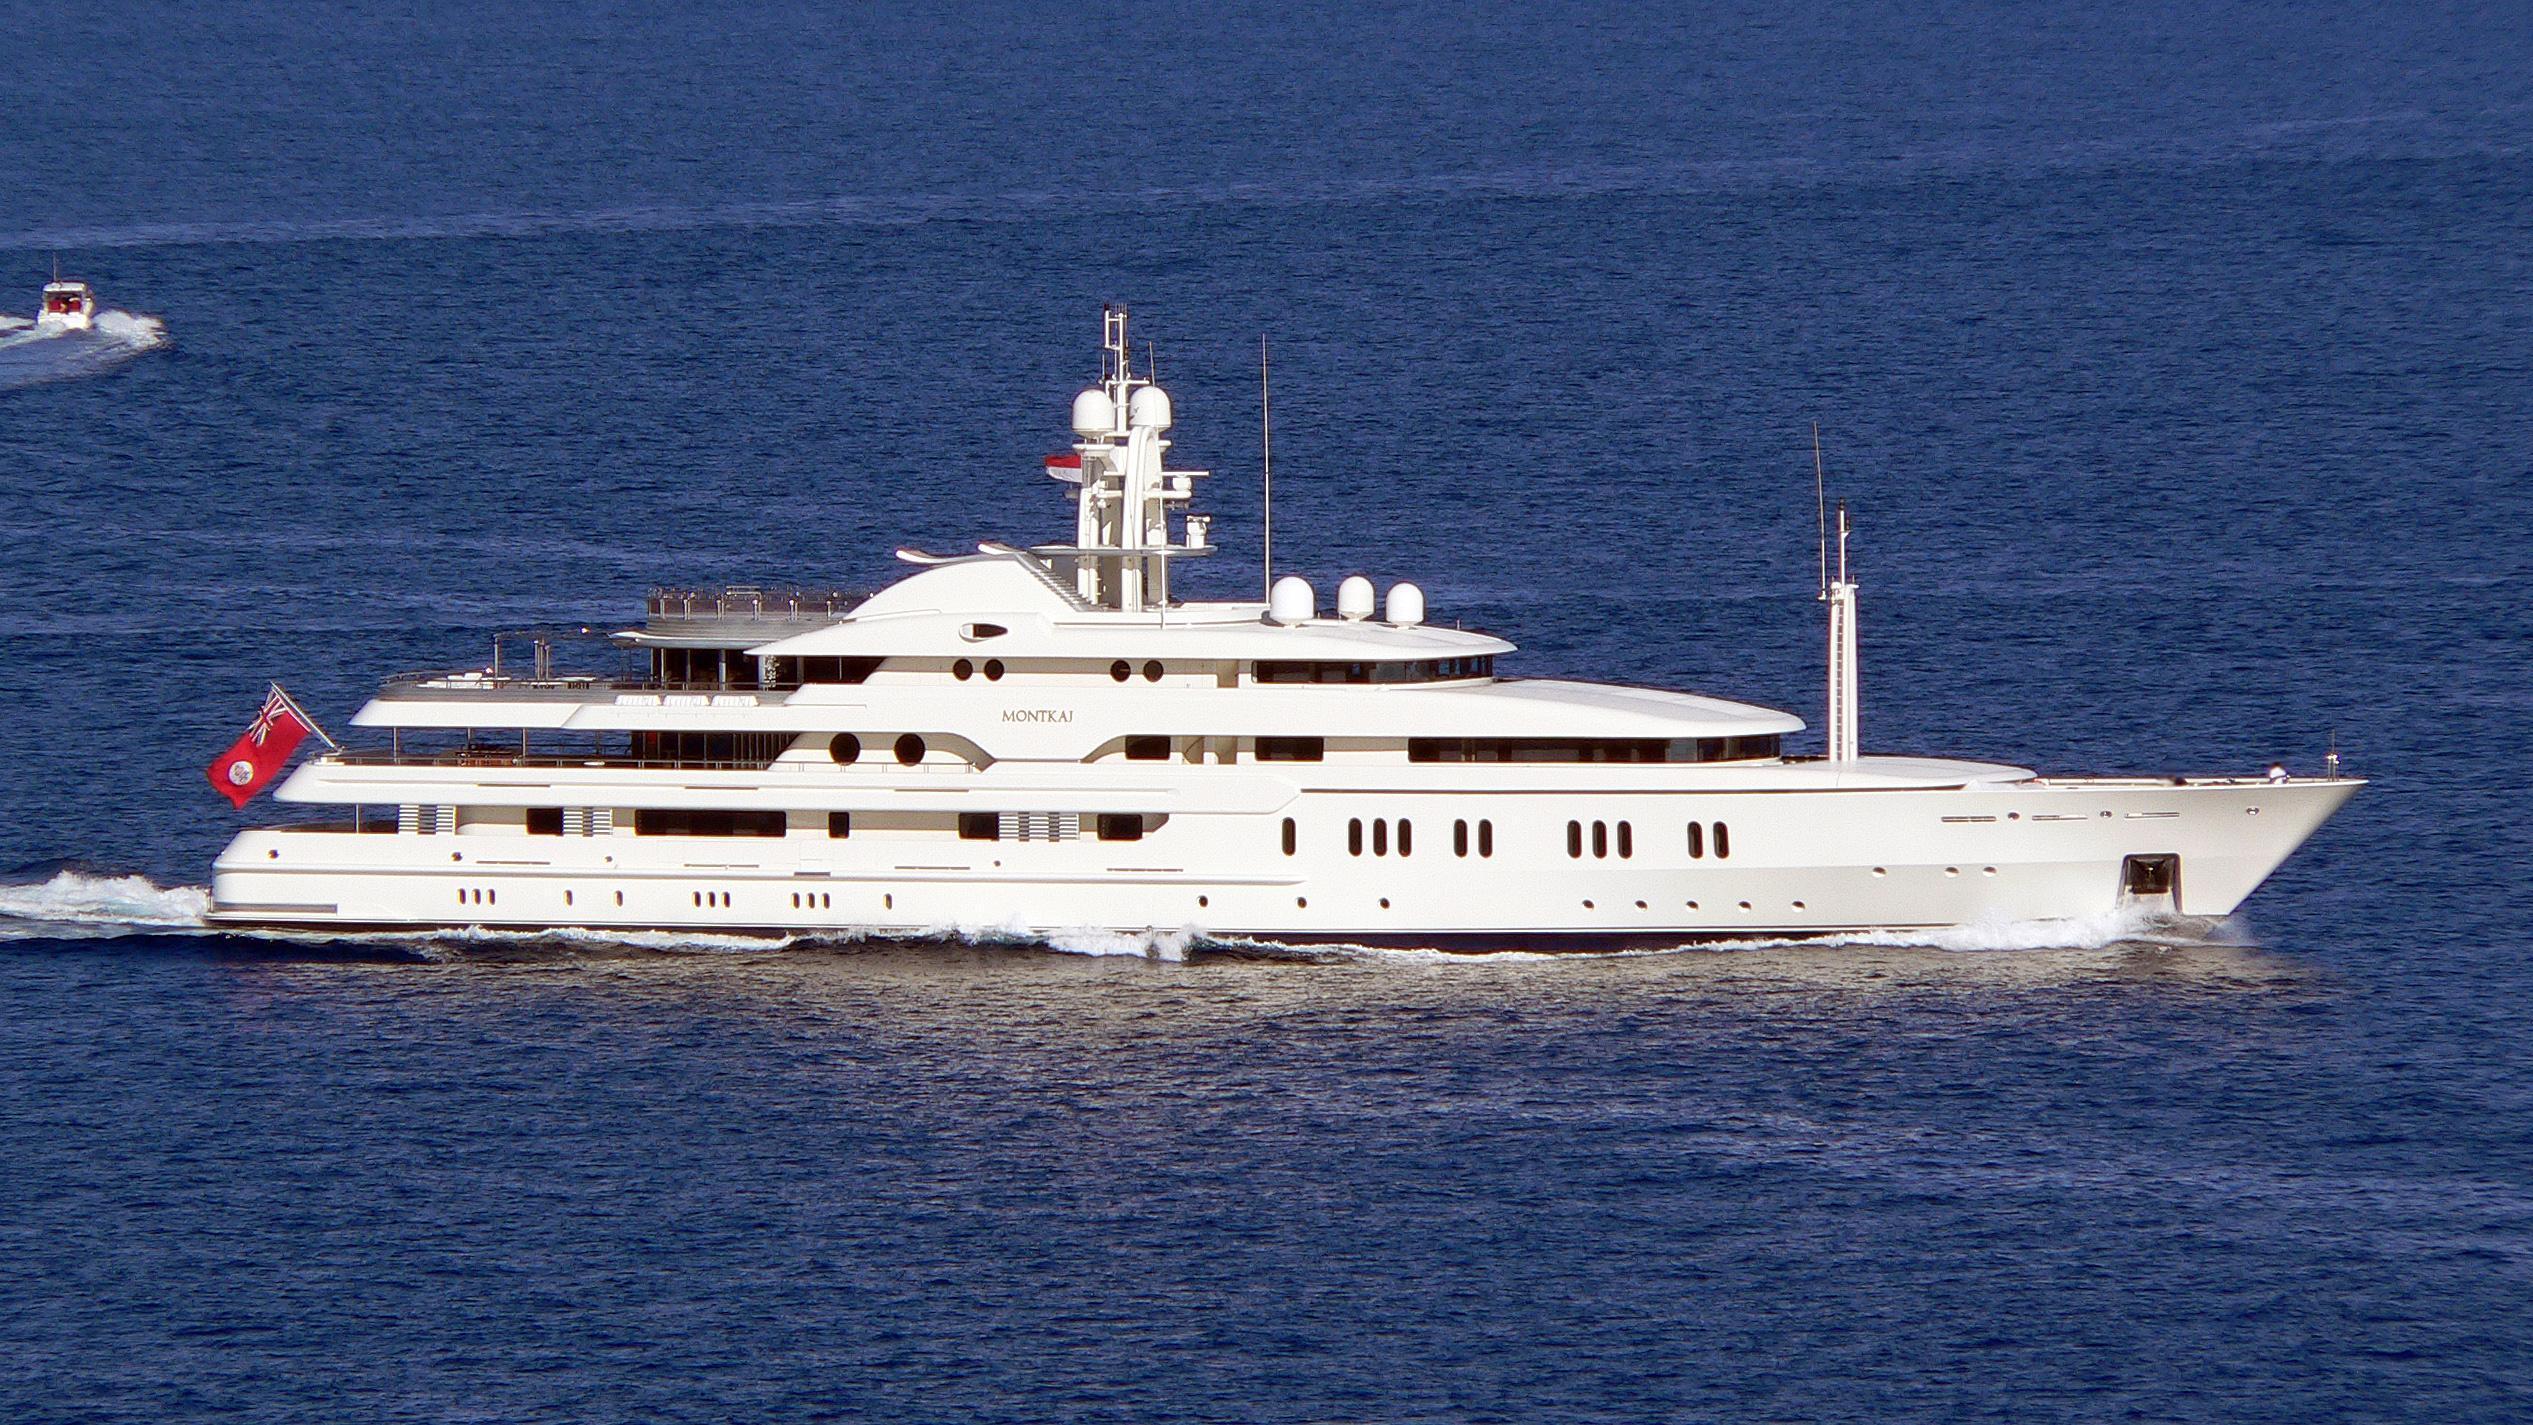 montkaj-motor-yacht-amels-1995-78m-cruising-profile